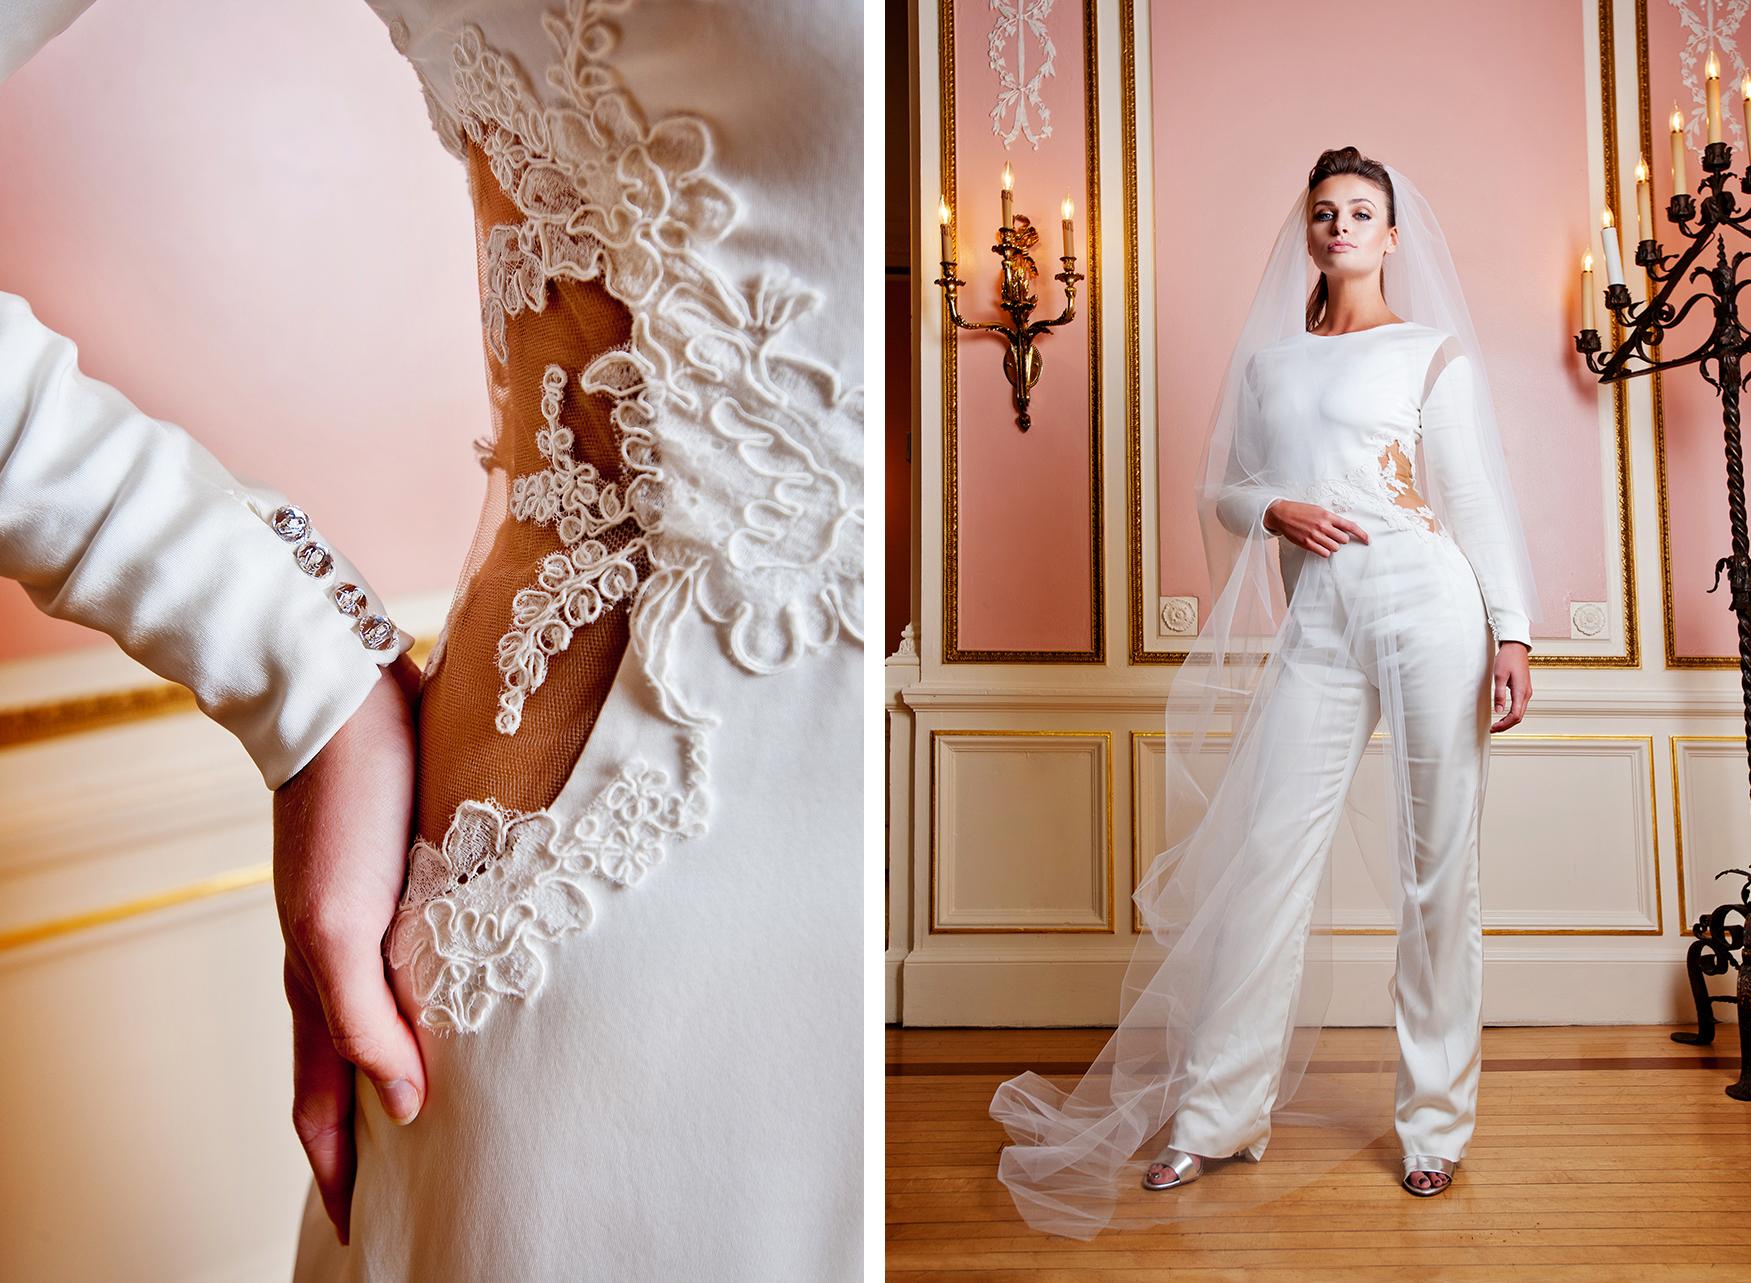 Wedding Jumpsuit With Veil.jpg